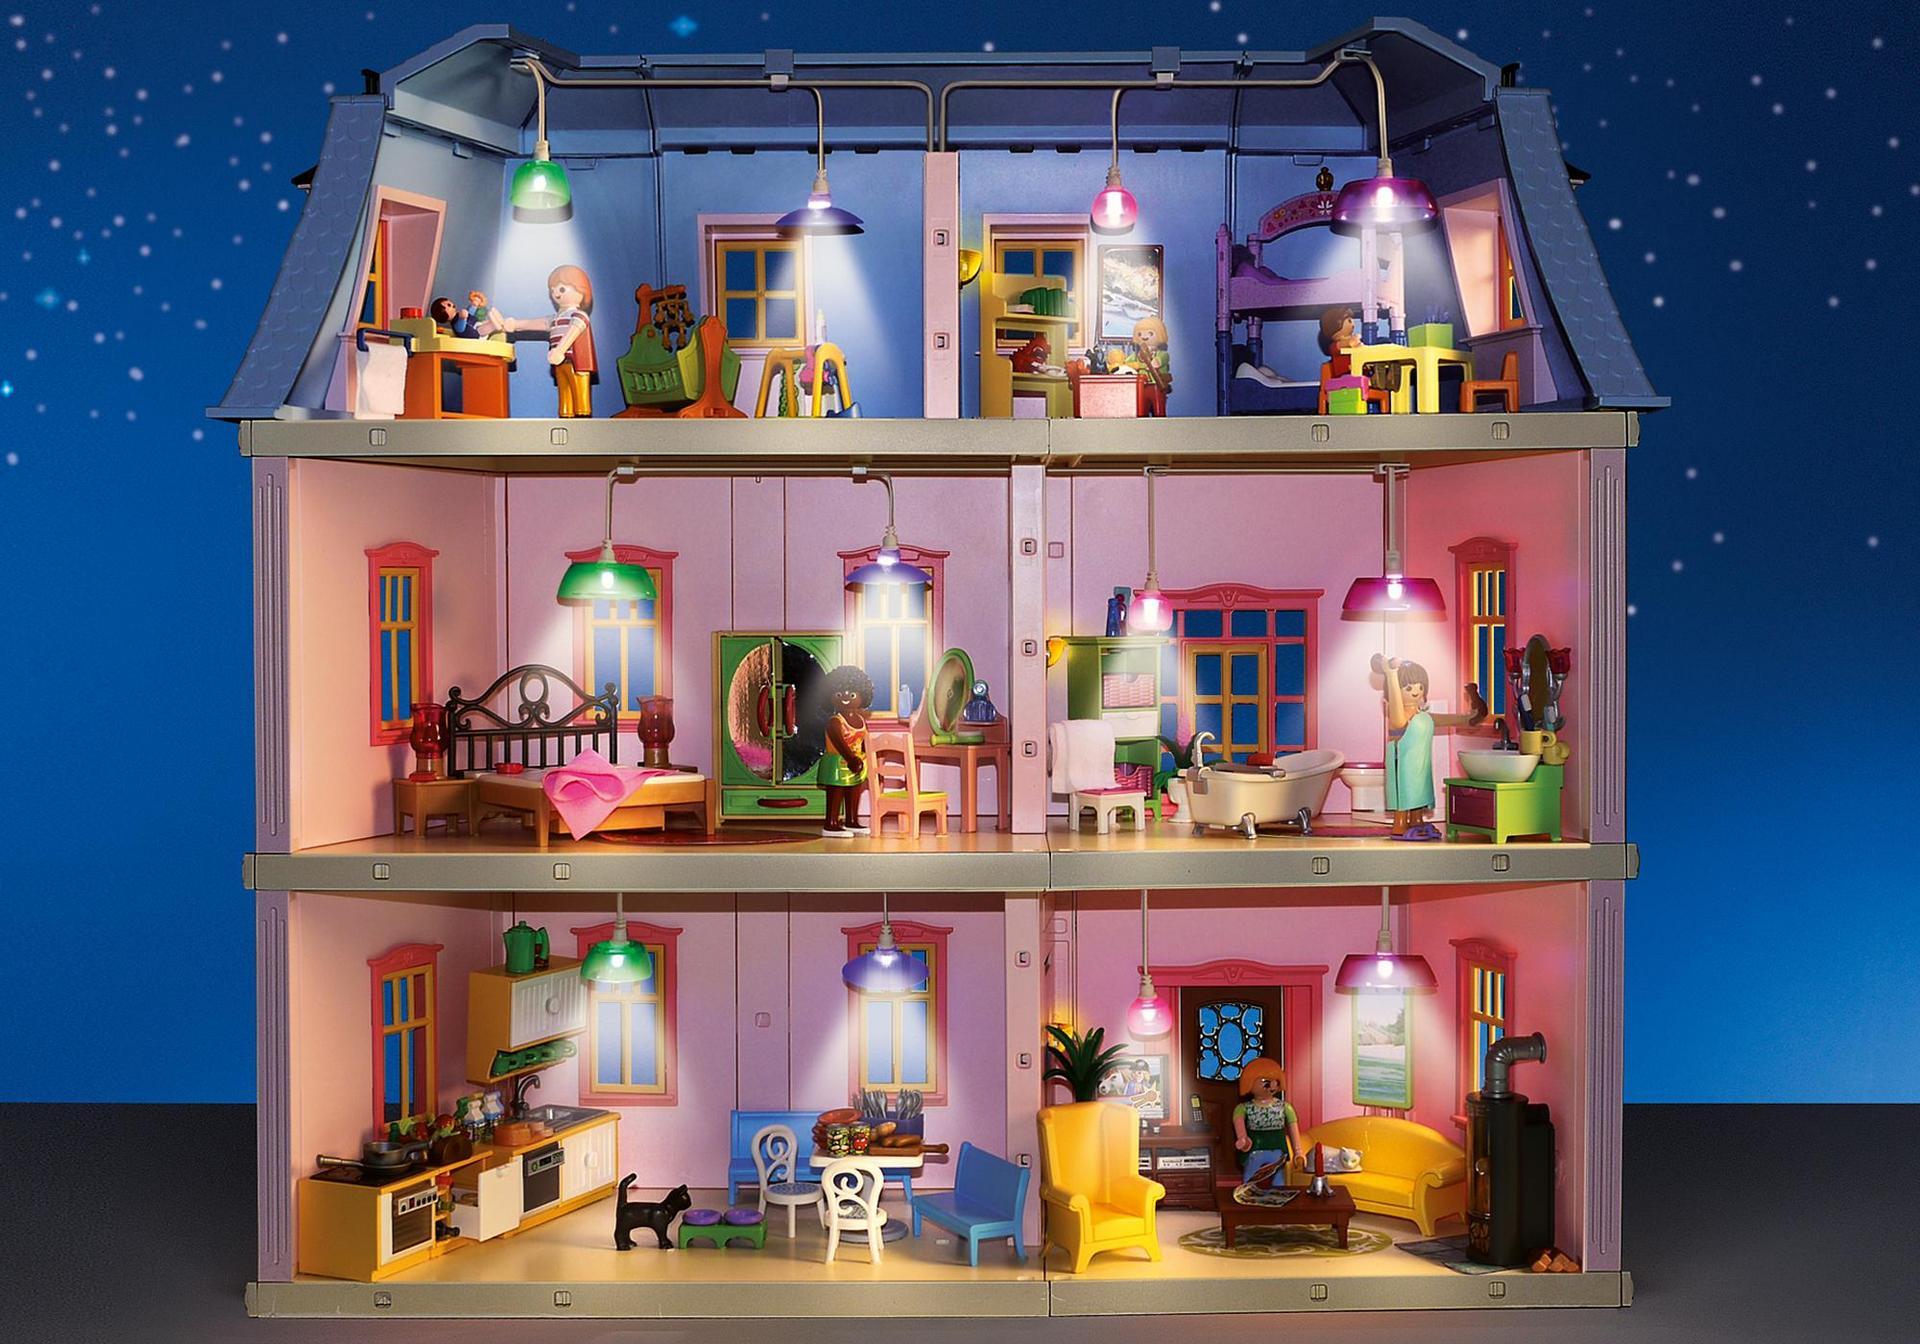 Set de iluminaci n para la casa de mu ecas rom ntica ref for La casa de playmobil